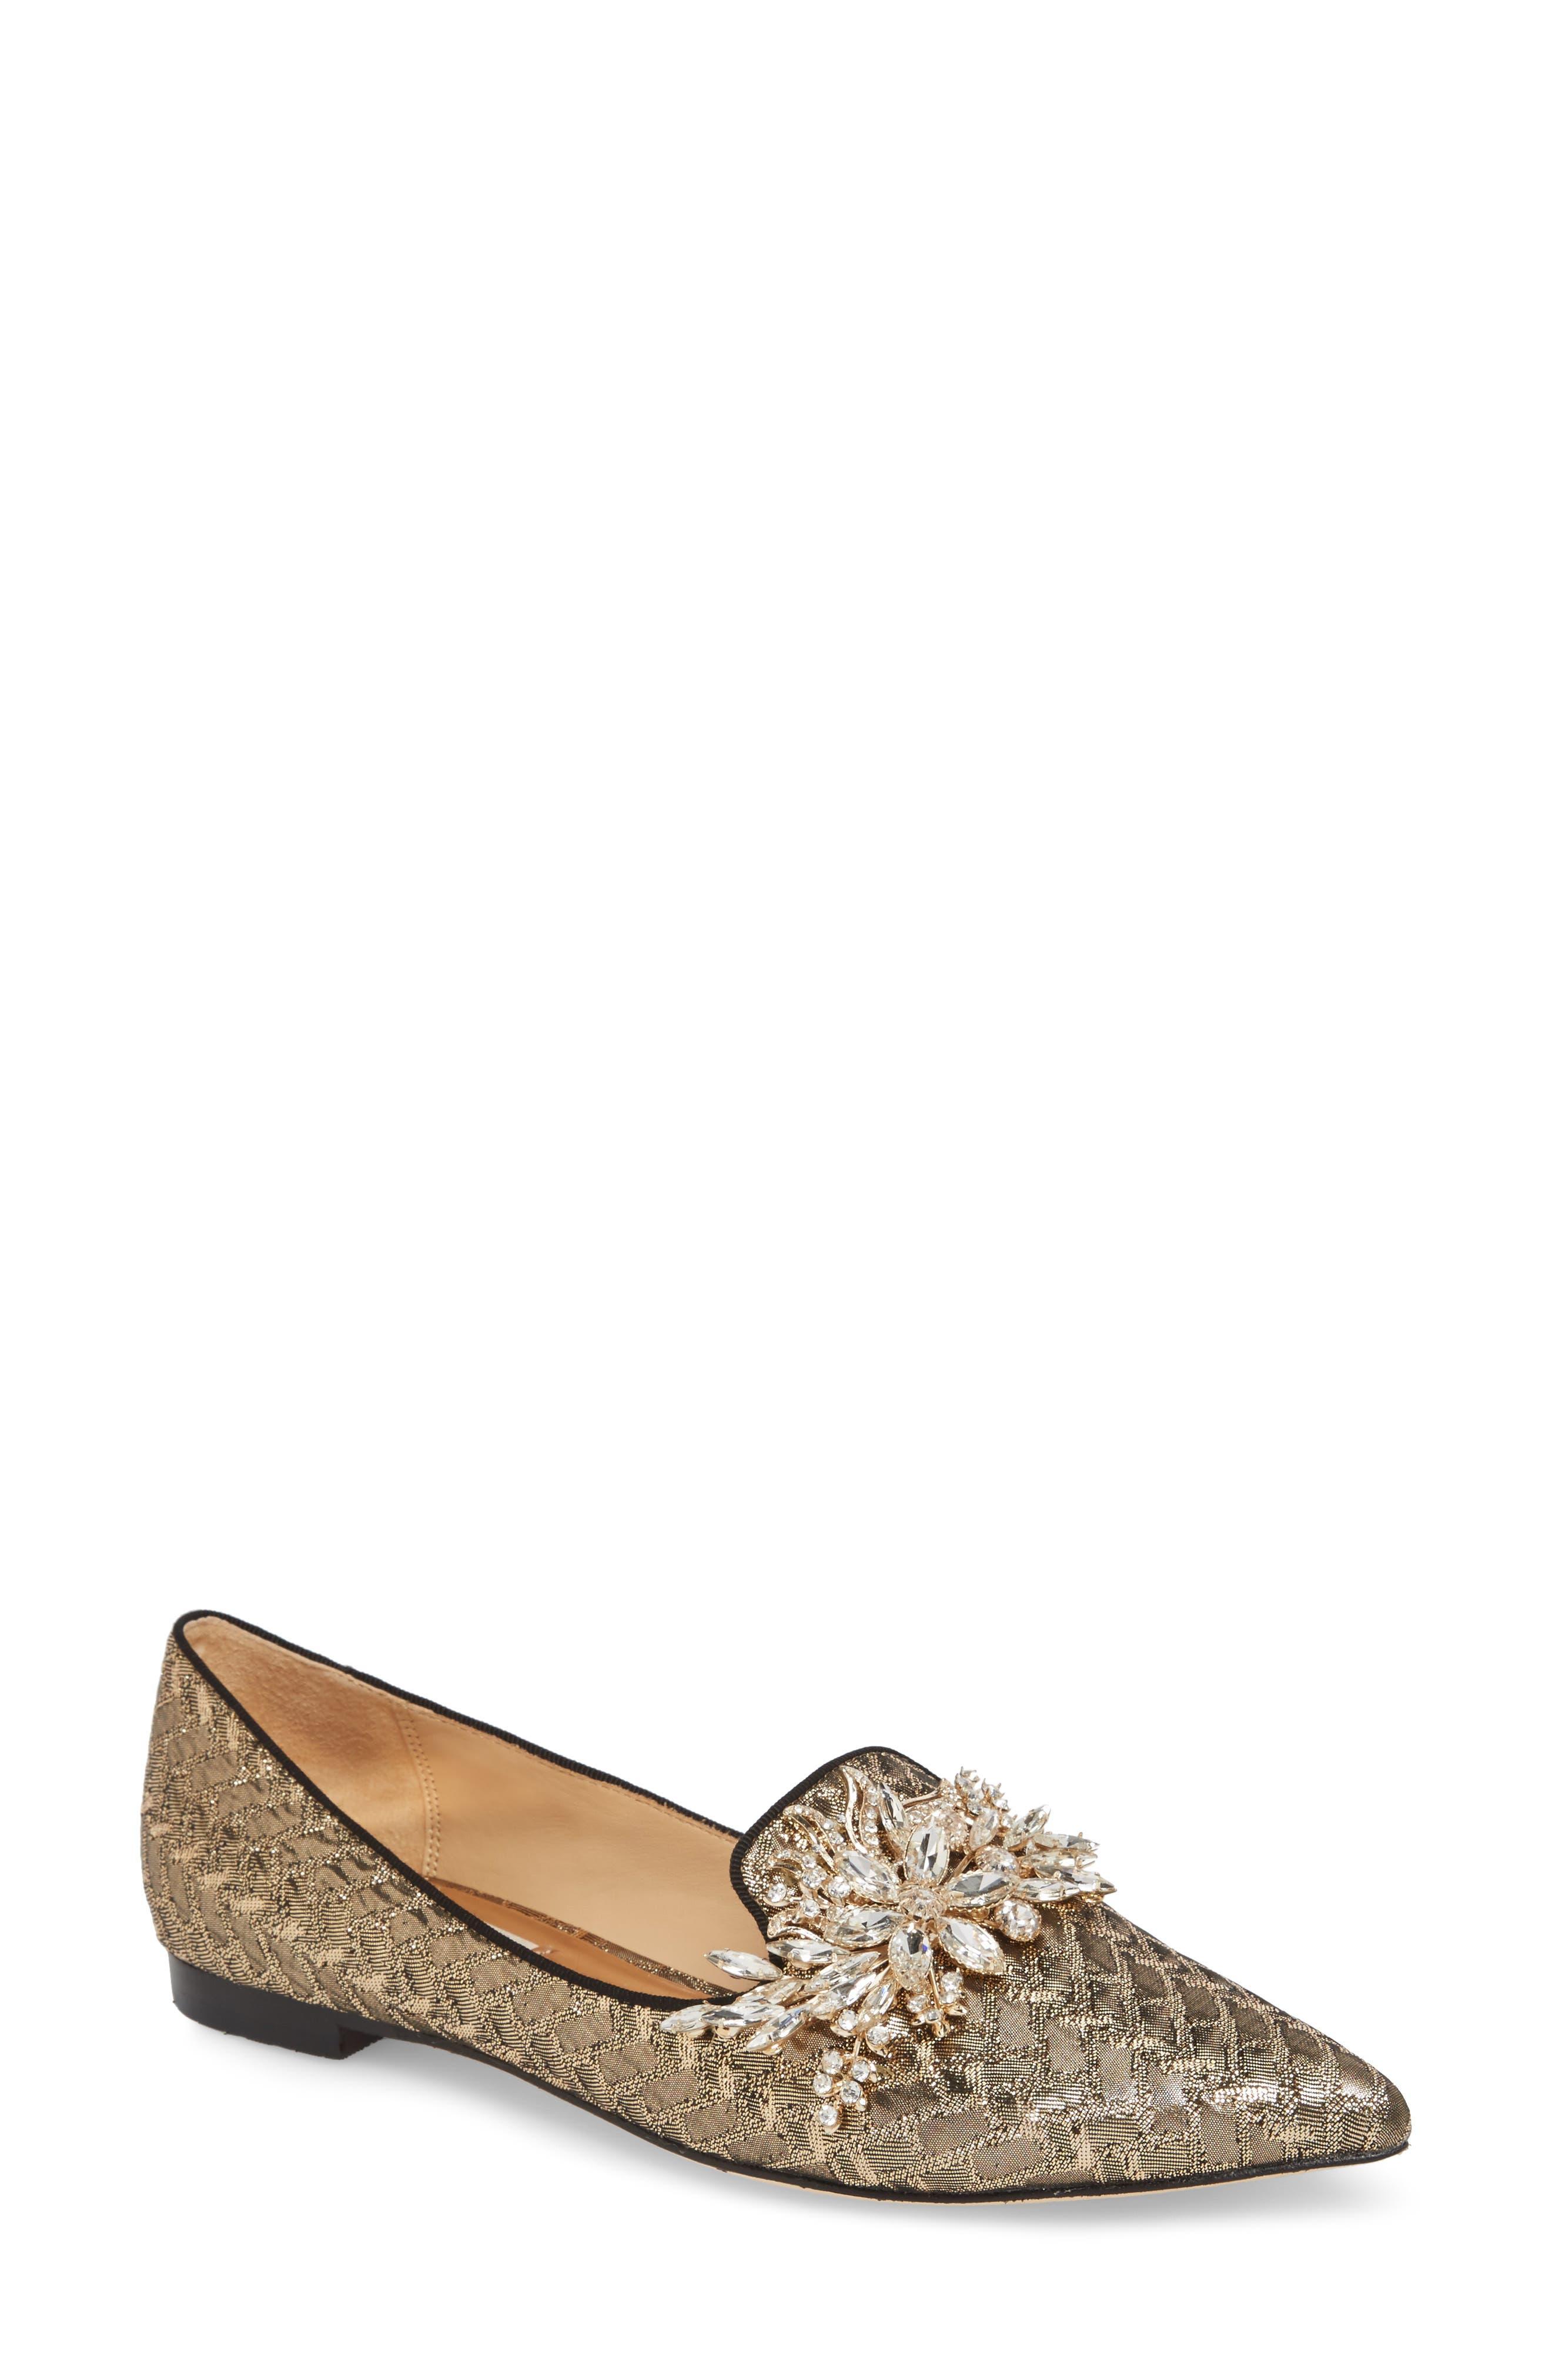 Badgley Mischka Mandy Embellished Loafer Flat (Women)